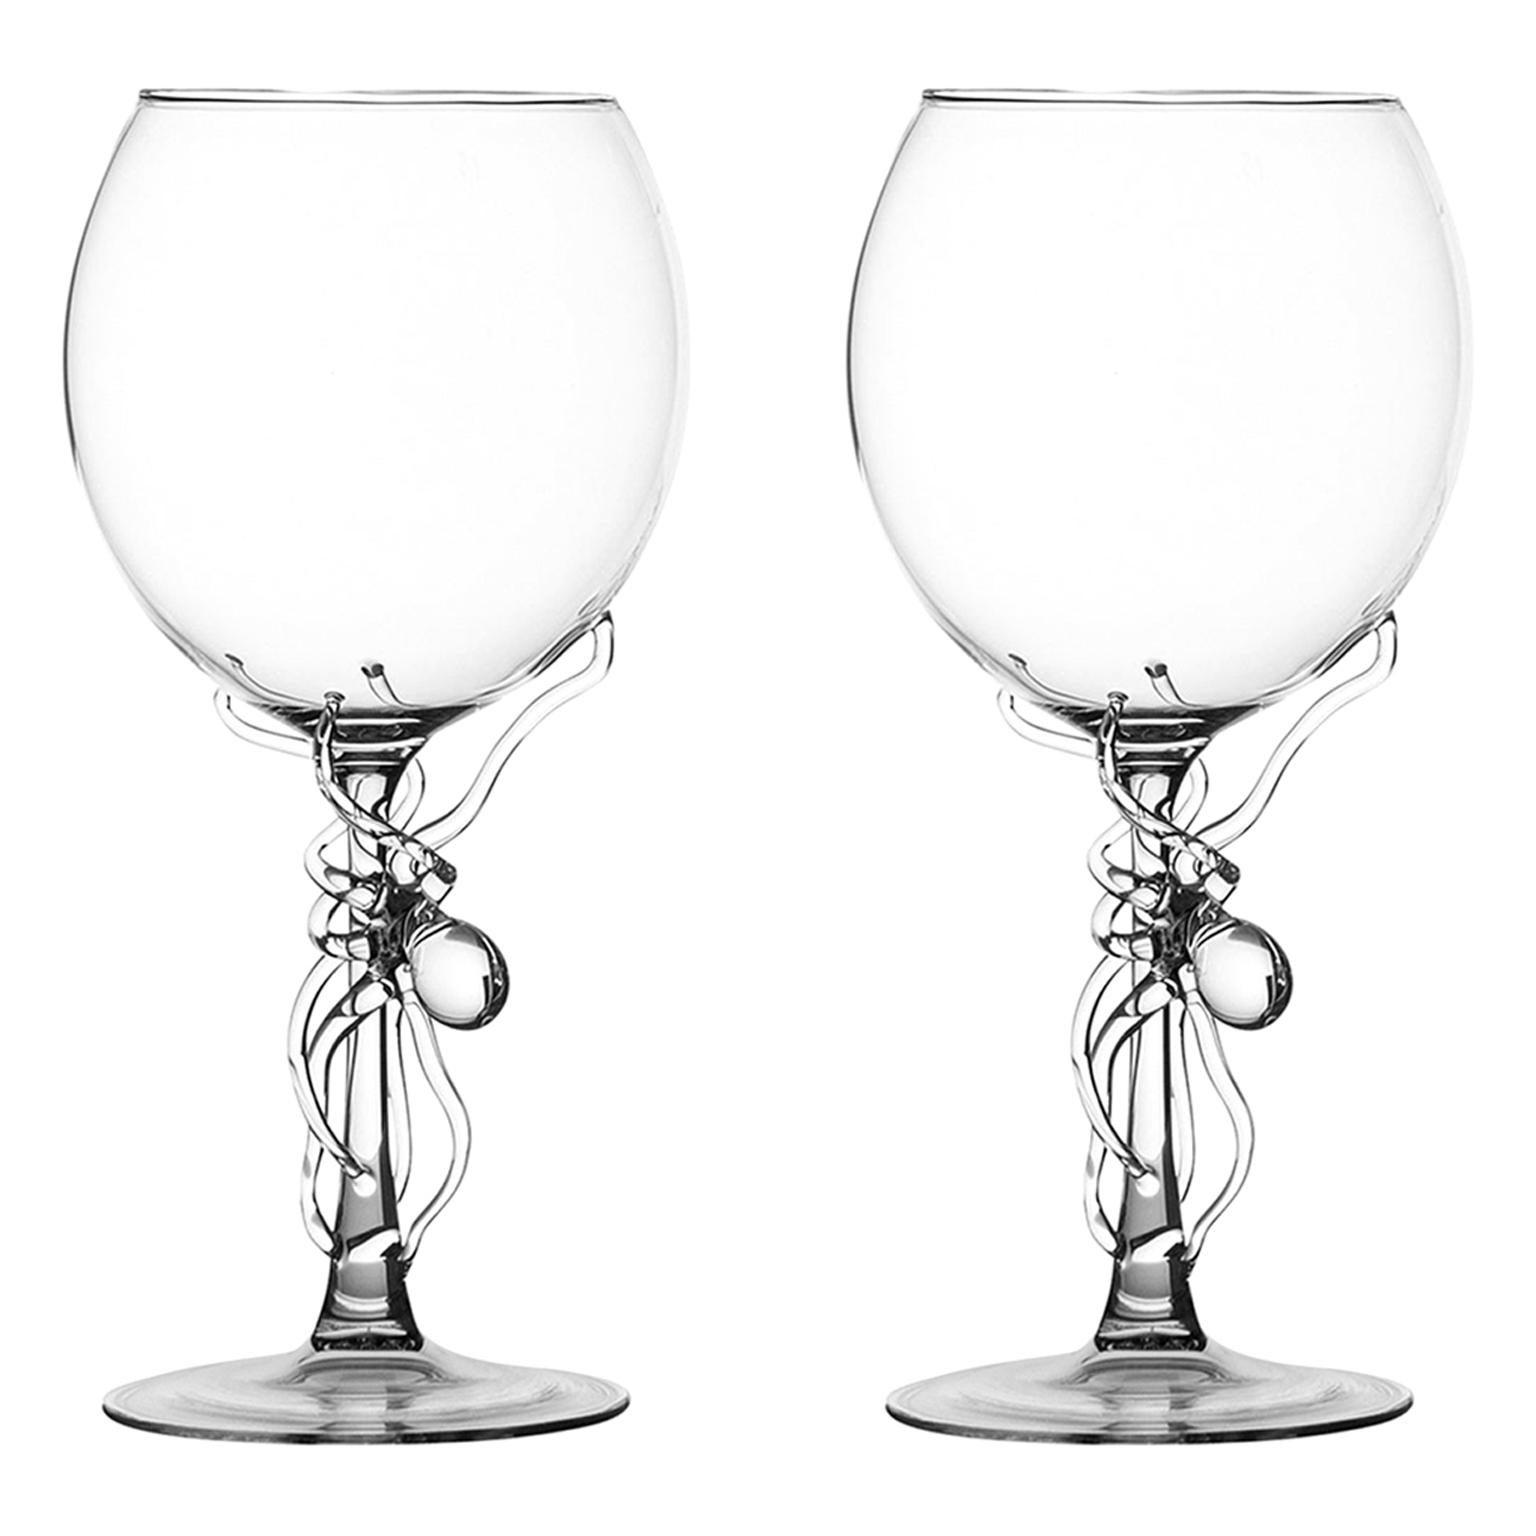 'Pair of Polpo Wine Glasses' Hand Blown Wine Glasses by Simone Crestani